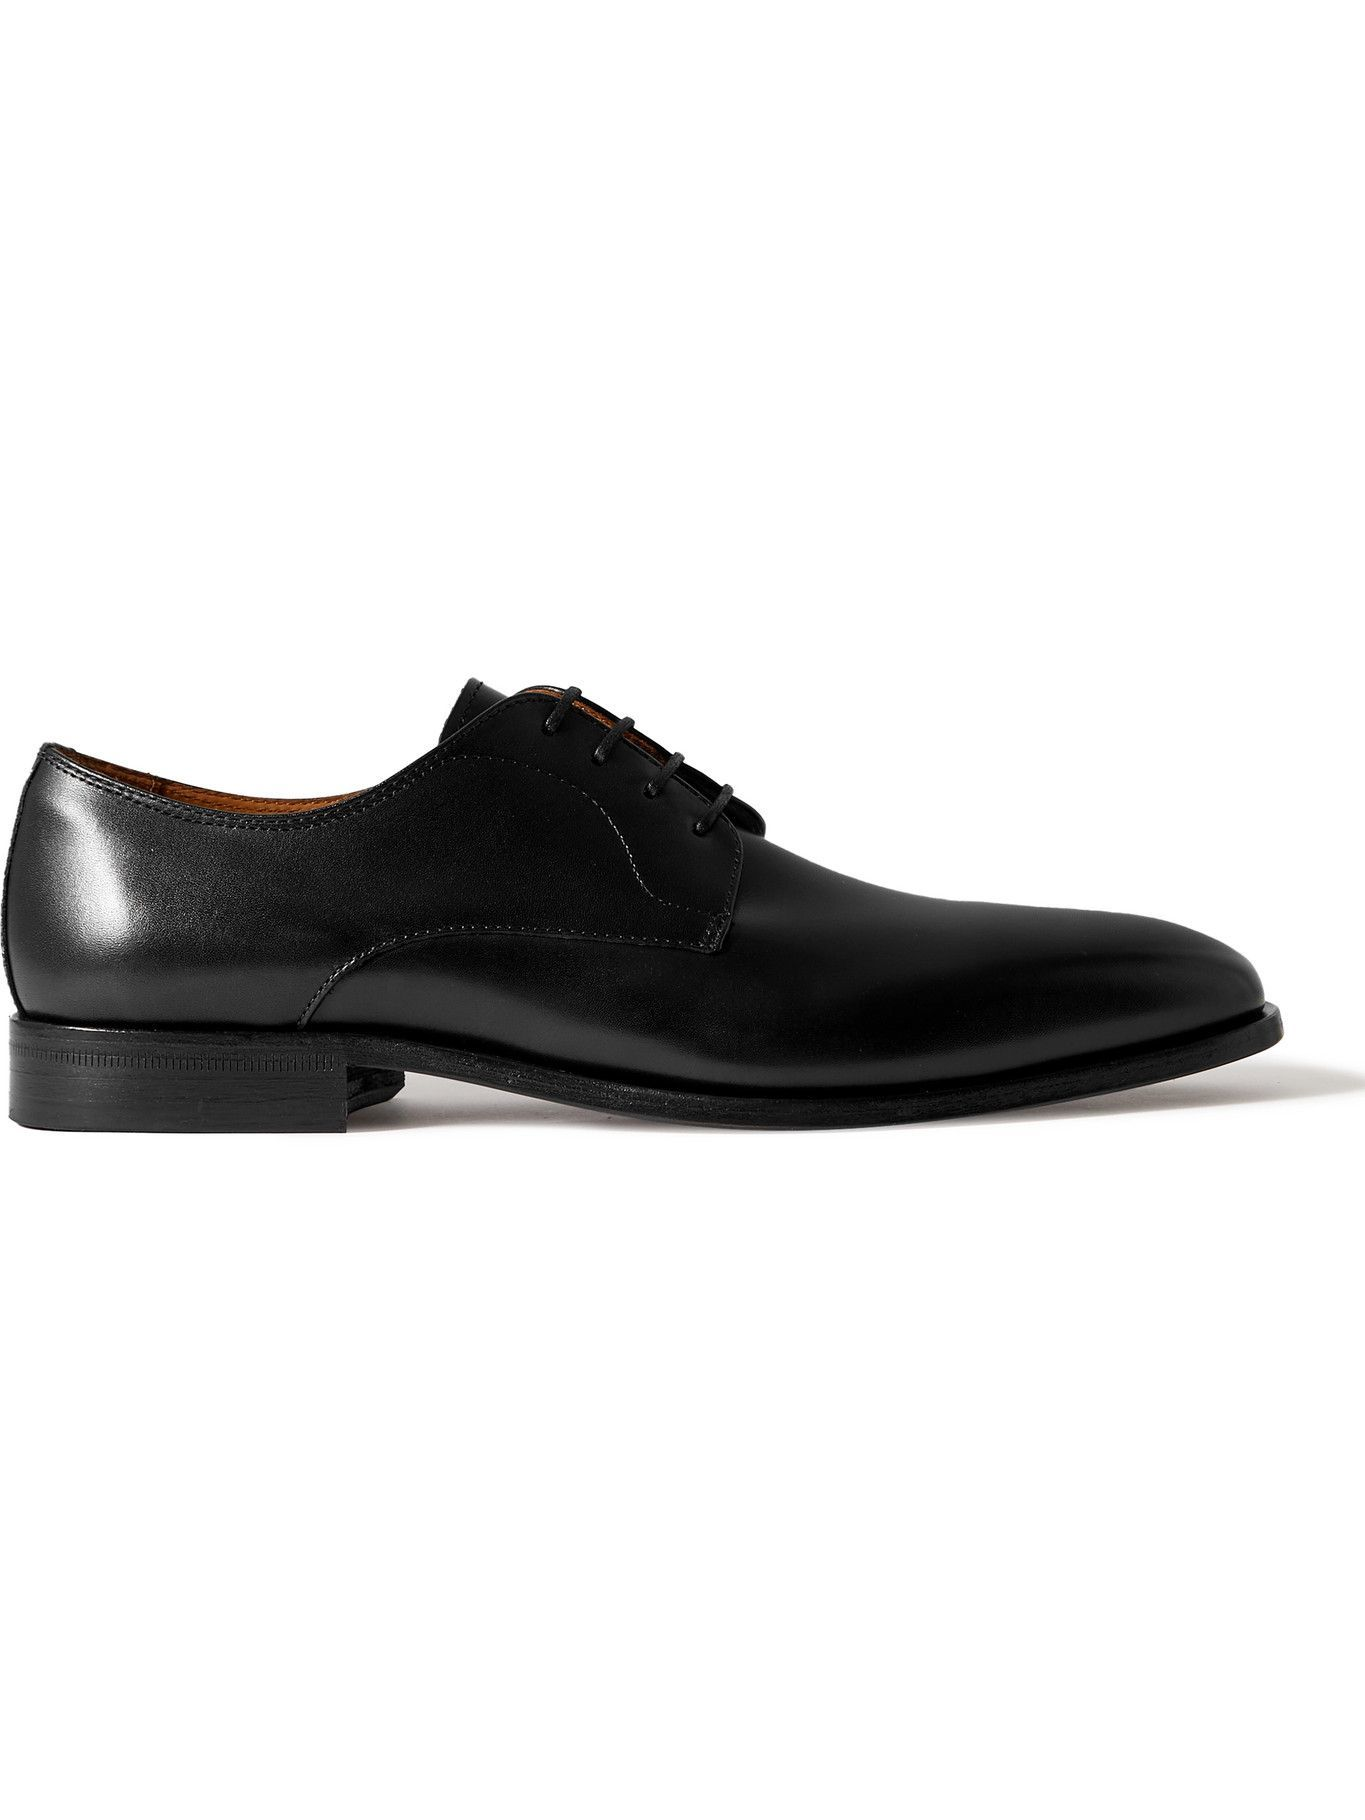 HUGO BOSS - Lisbon Leather Derby Shoes - Black